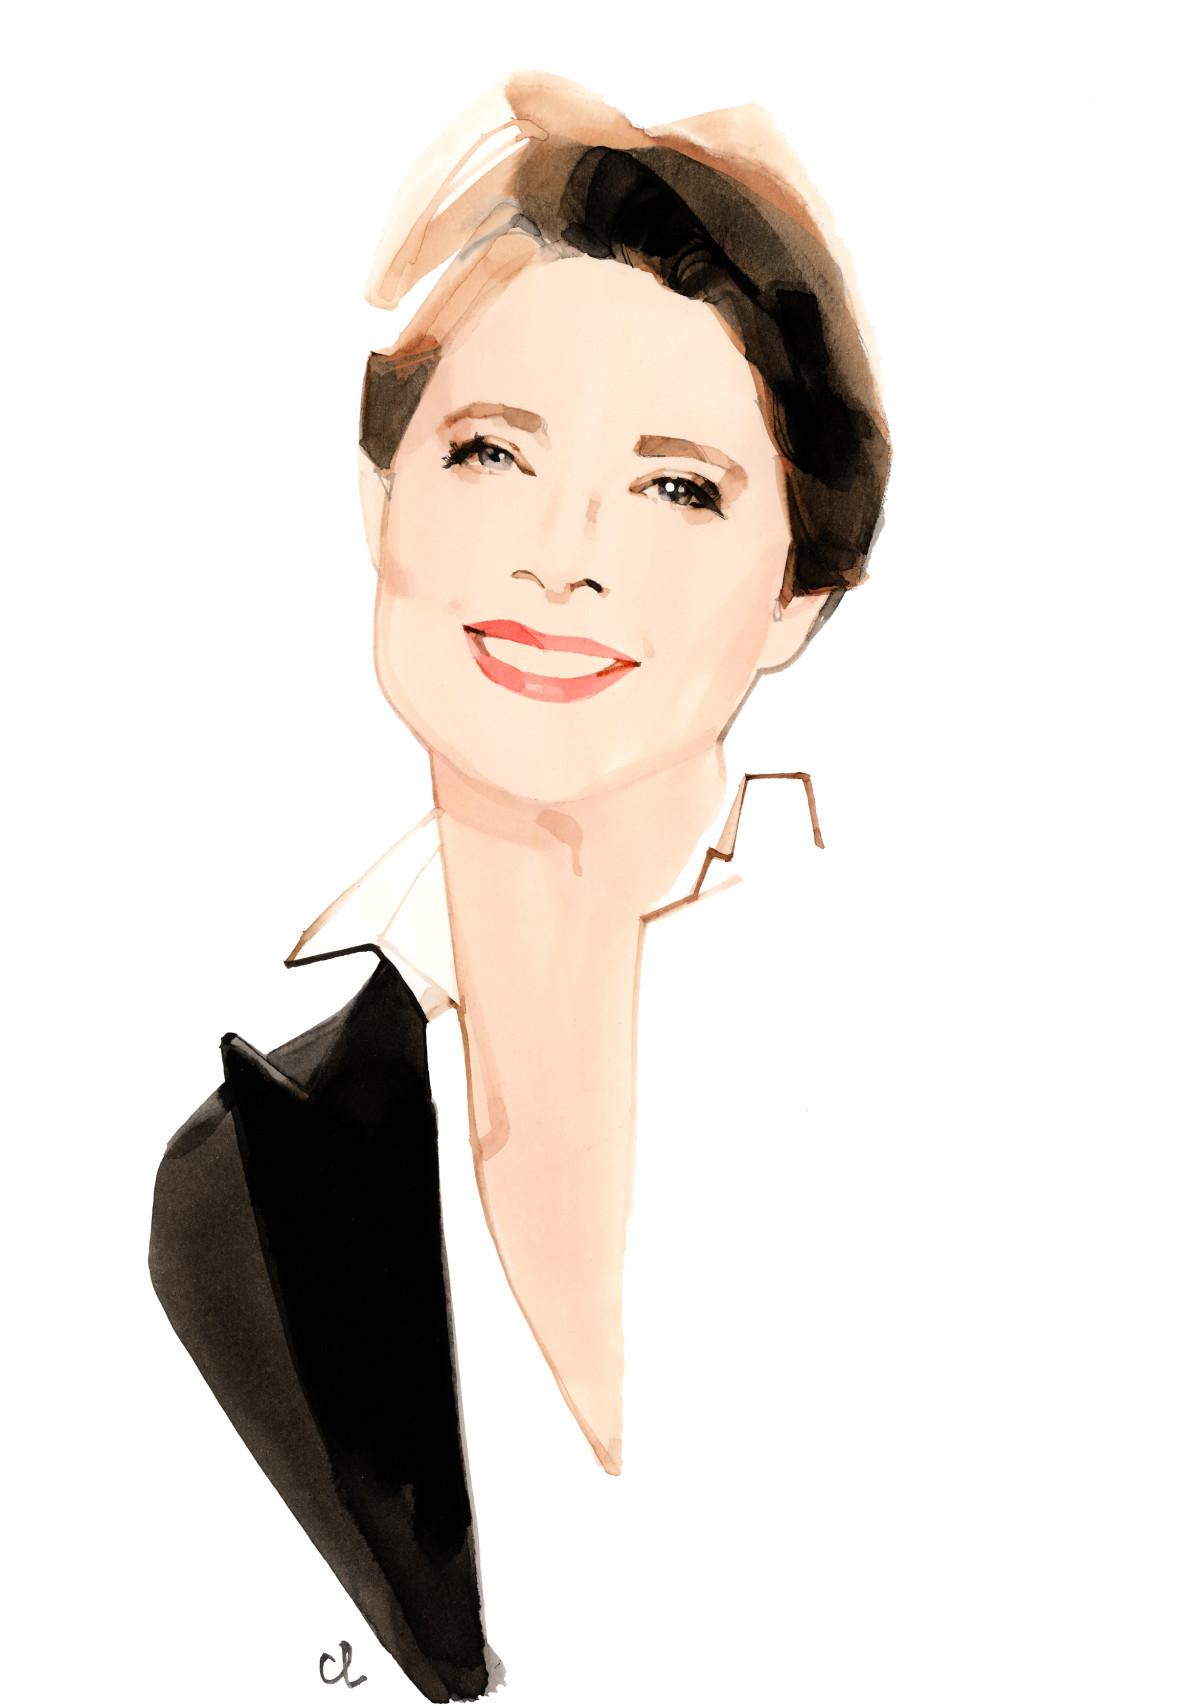 Lancôme Spokesmodel Isabella Rossellini Is Back